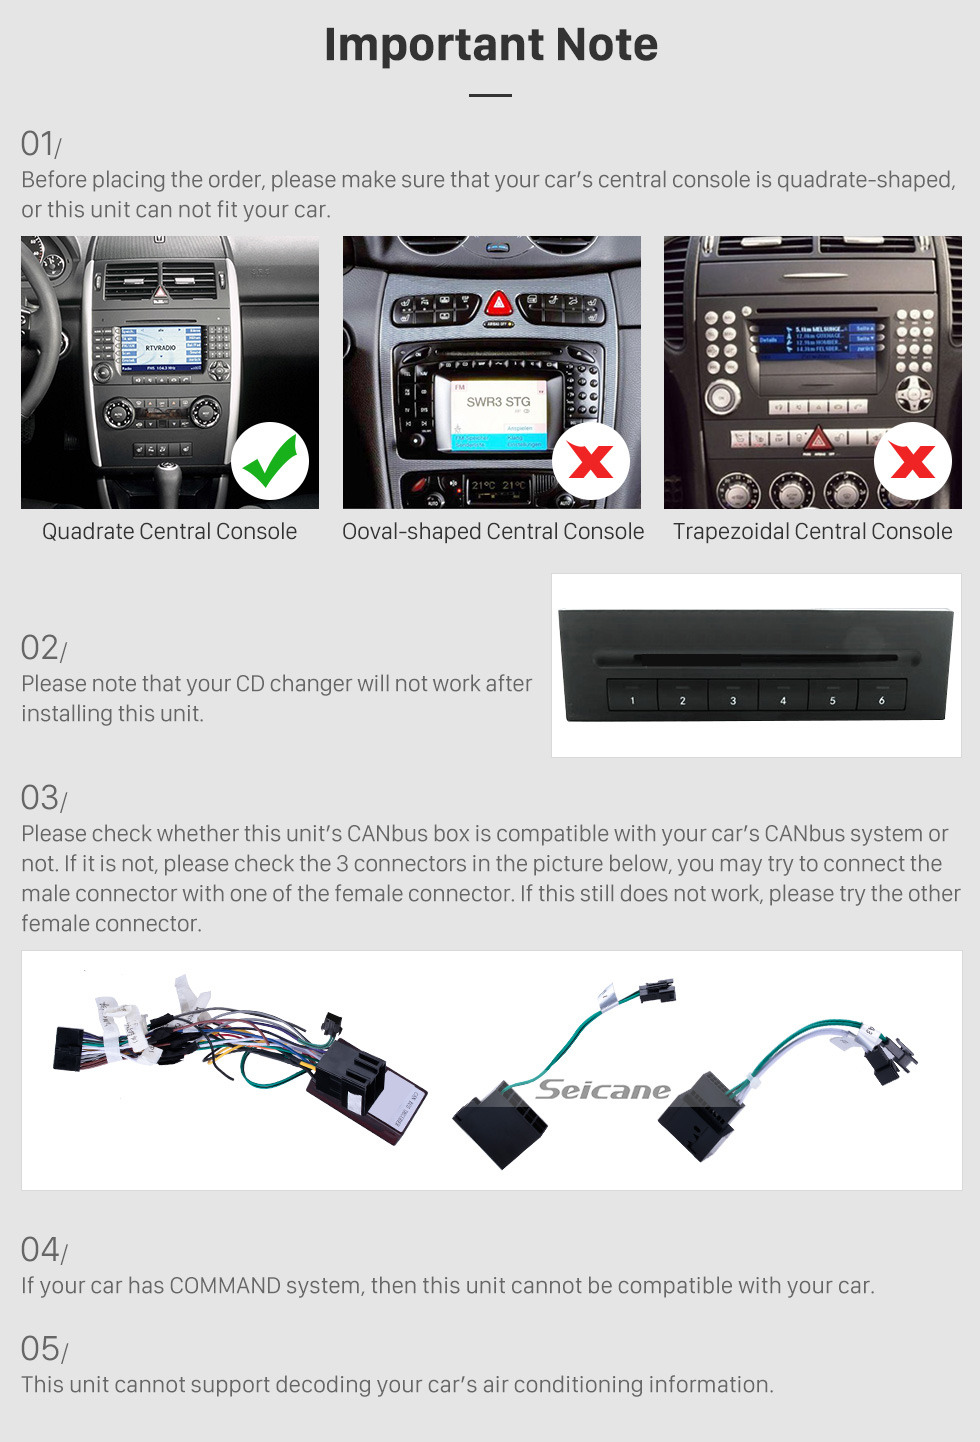 Seicane 9 inch 1024*600 touchscreen Radio for 2006-2012 Mercedes Benz Sprinter 211 CDI 309 CDI 311 CDI 509 CDI Benz A-class W169 A150 A170  Benz B-class W245 B170 B200 Benz Viano Vito W639  Benz W315 W318 Android 10.0 In Das